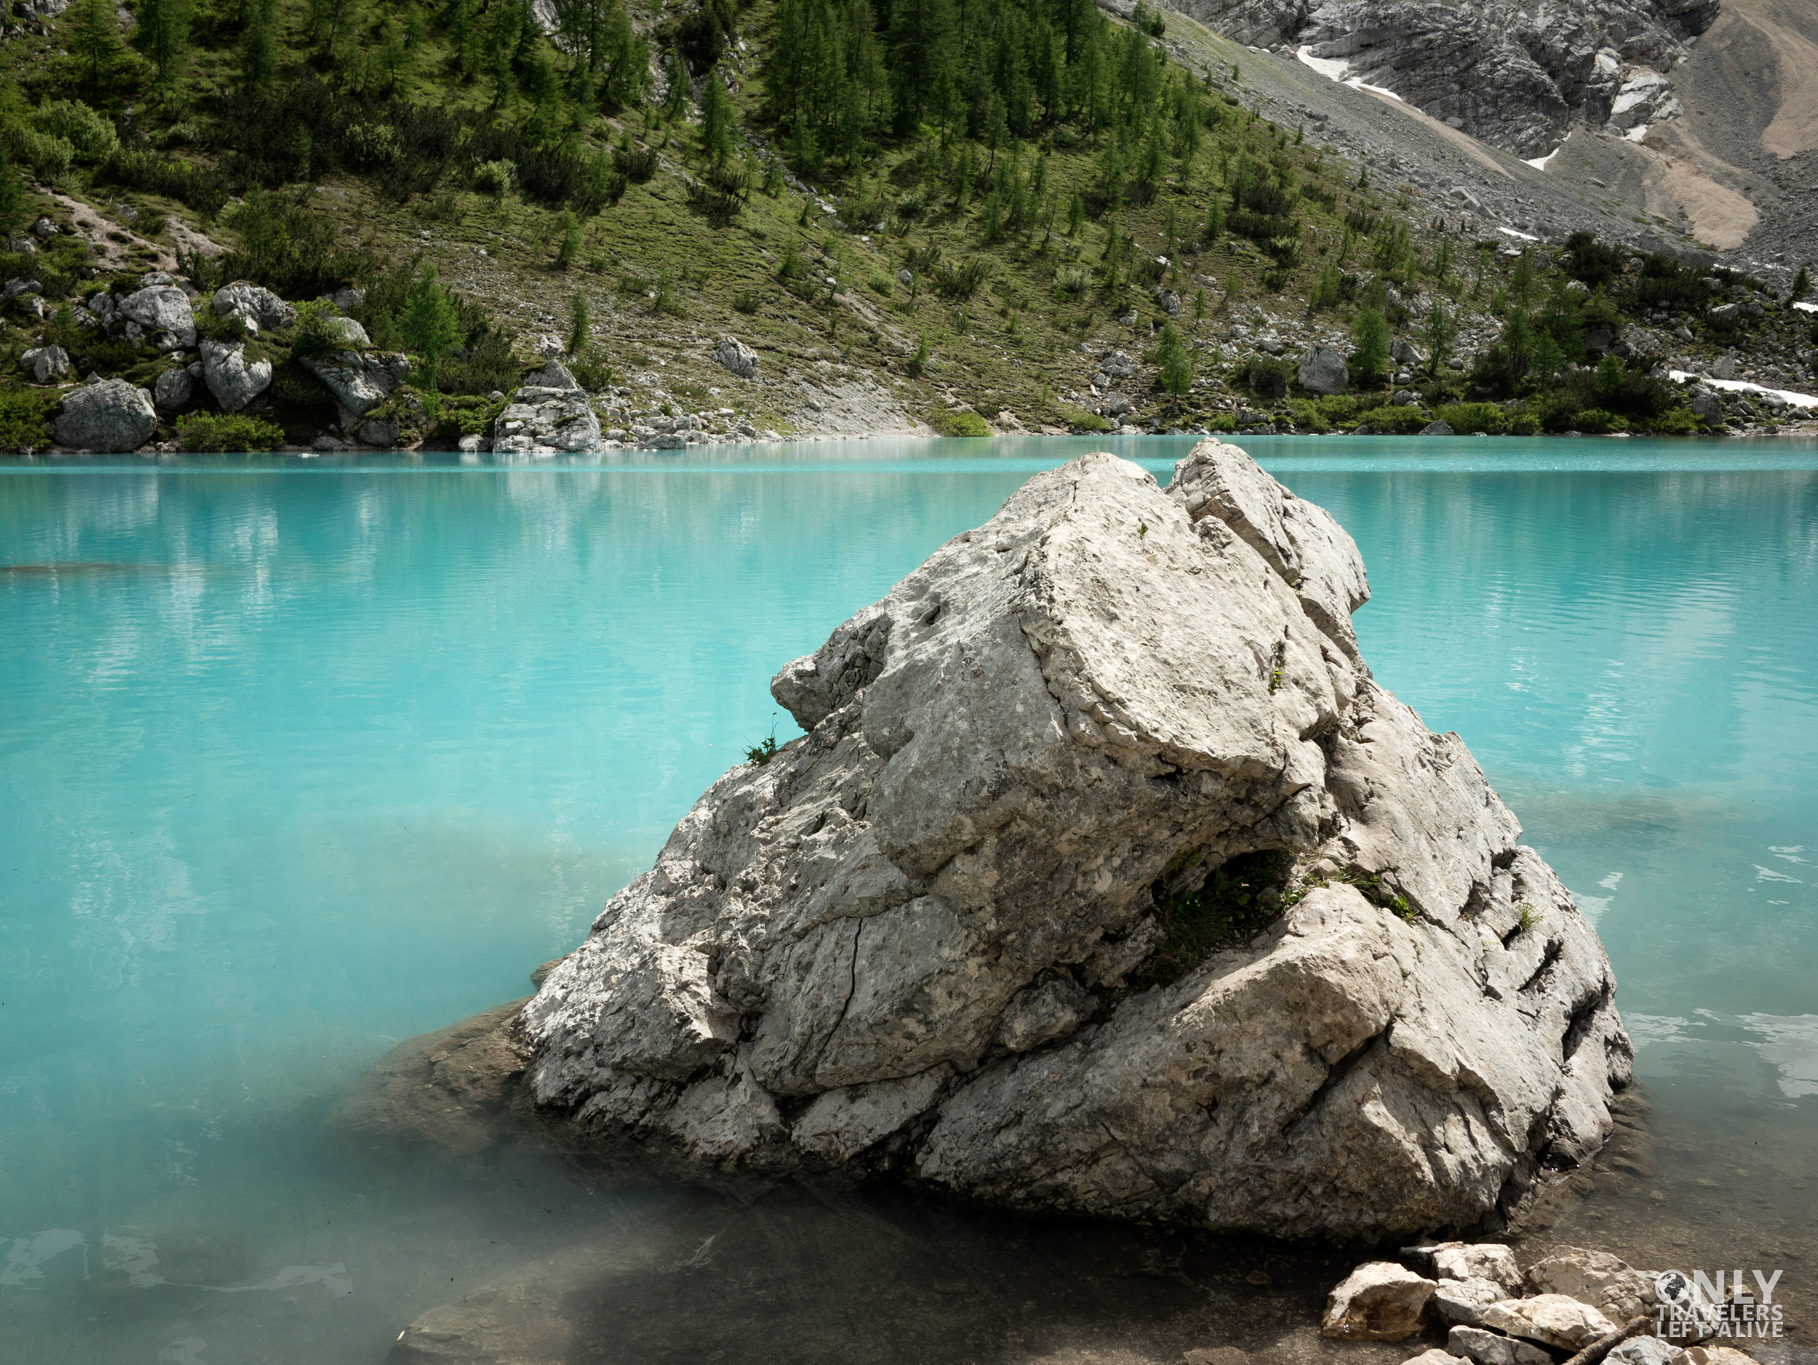 lago dolomity only travelers left alive